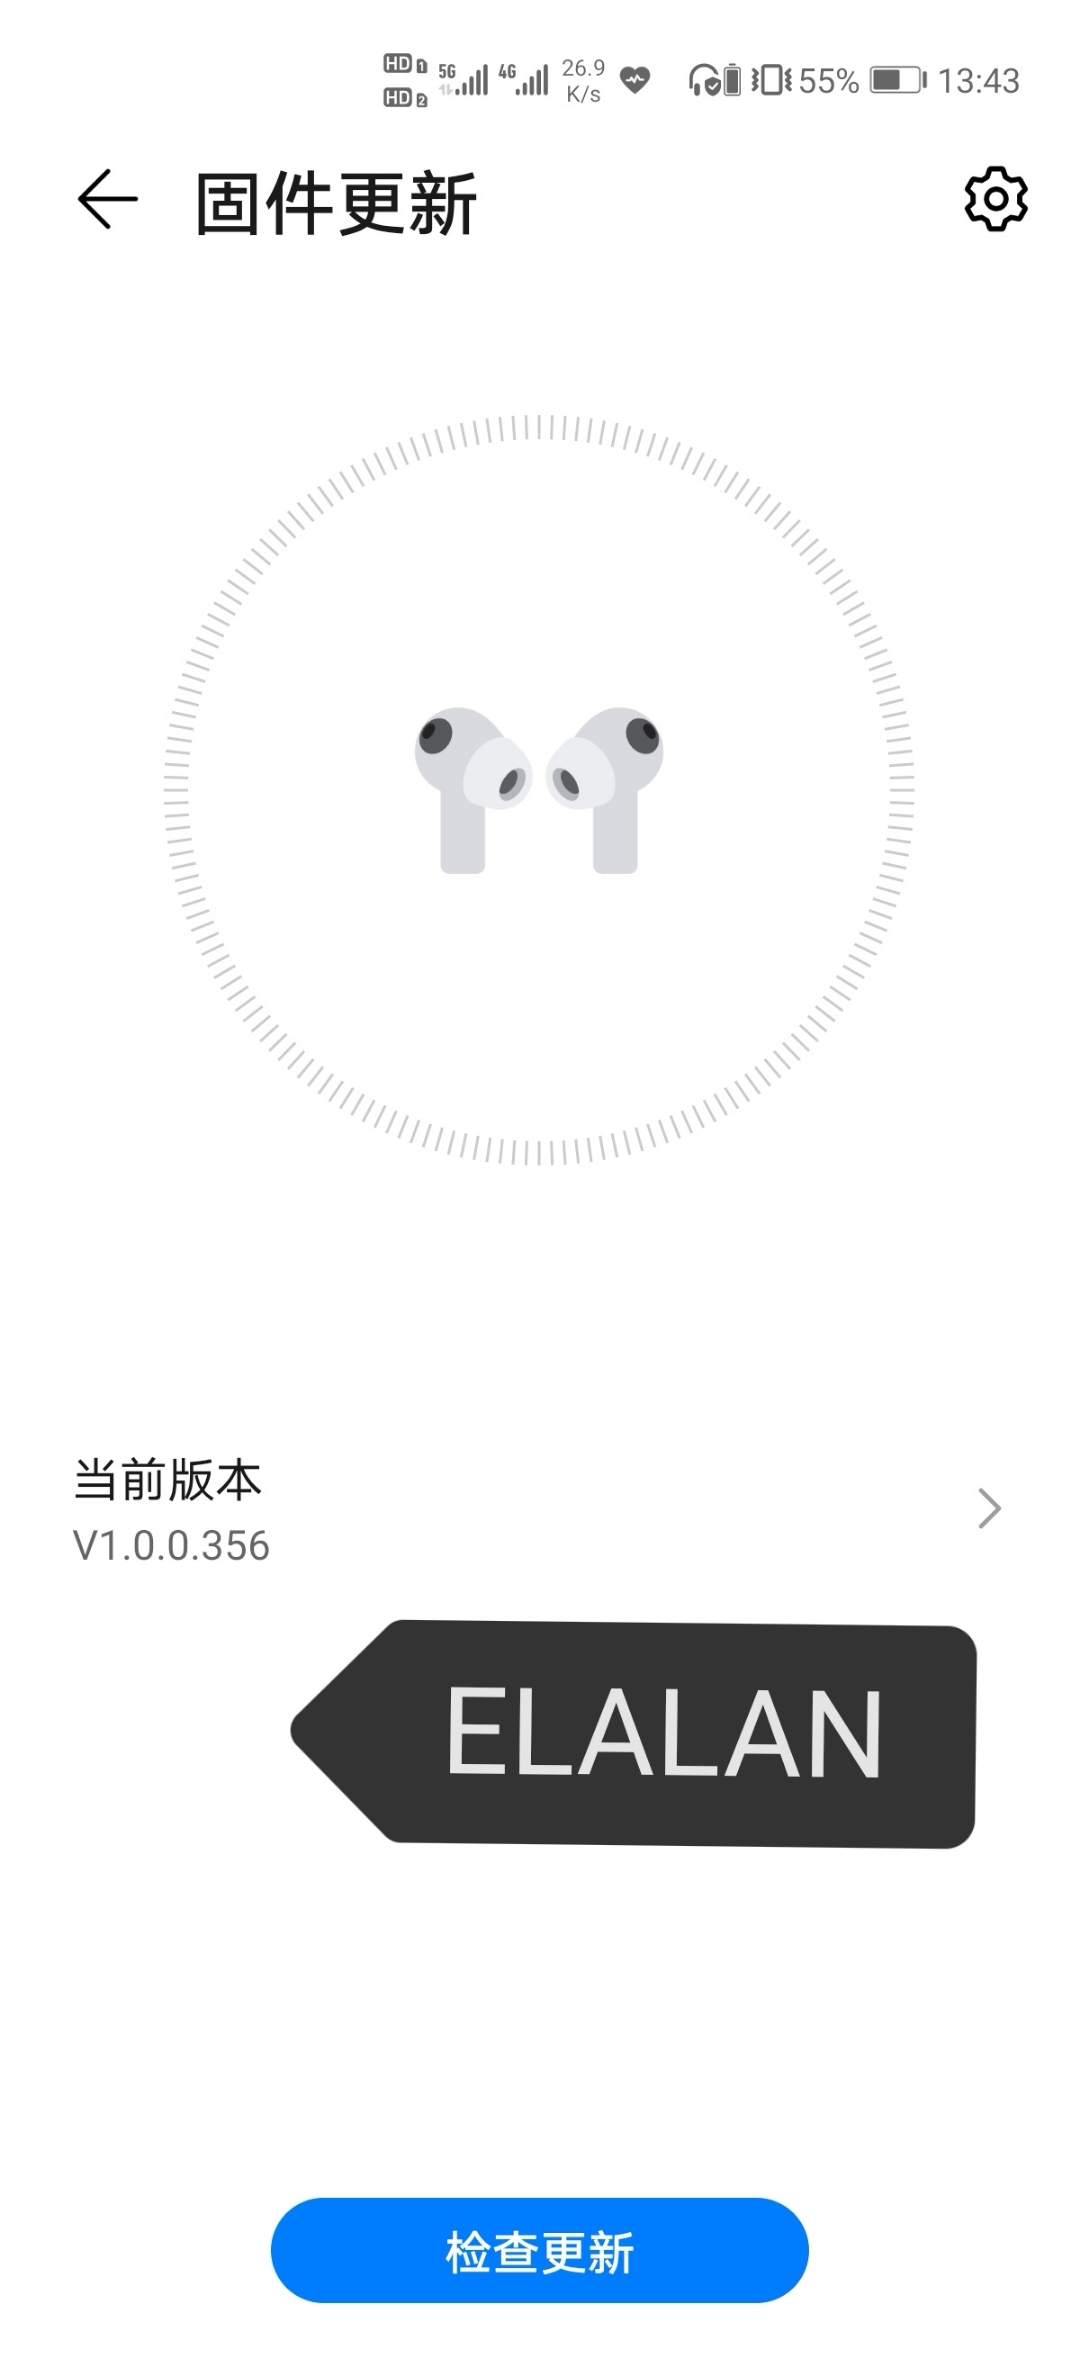 Screenshot_20210329_134339_com.huawei.smarthome_edit_180681721291699.jpg